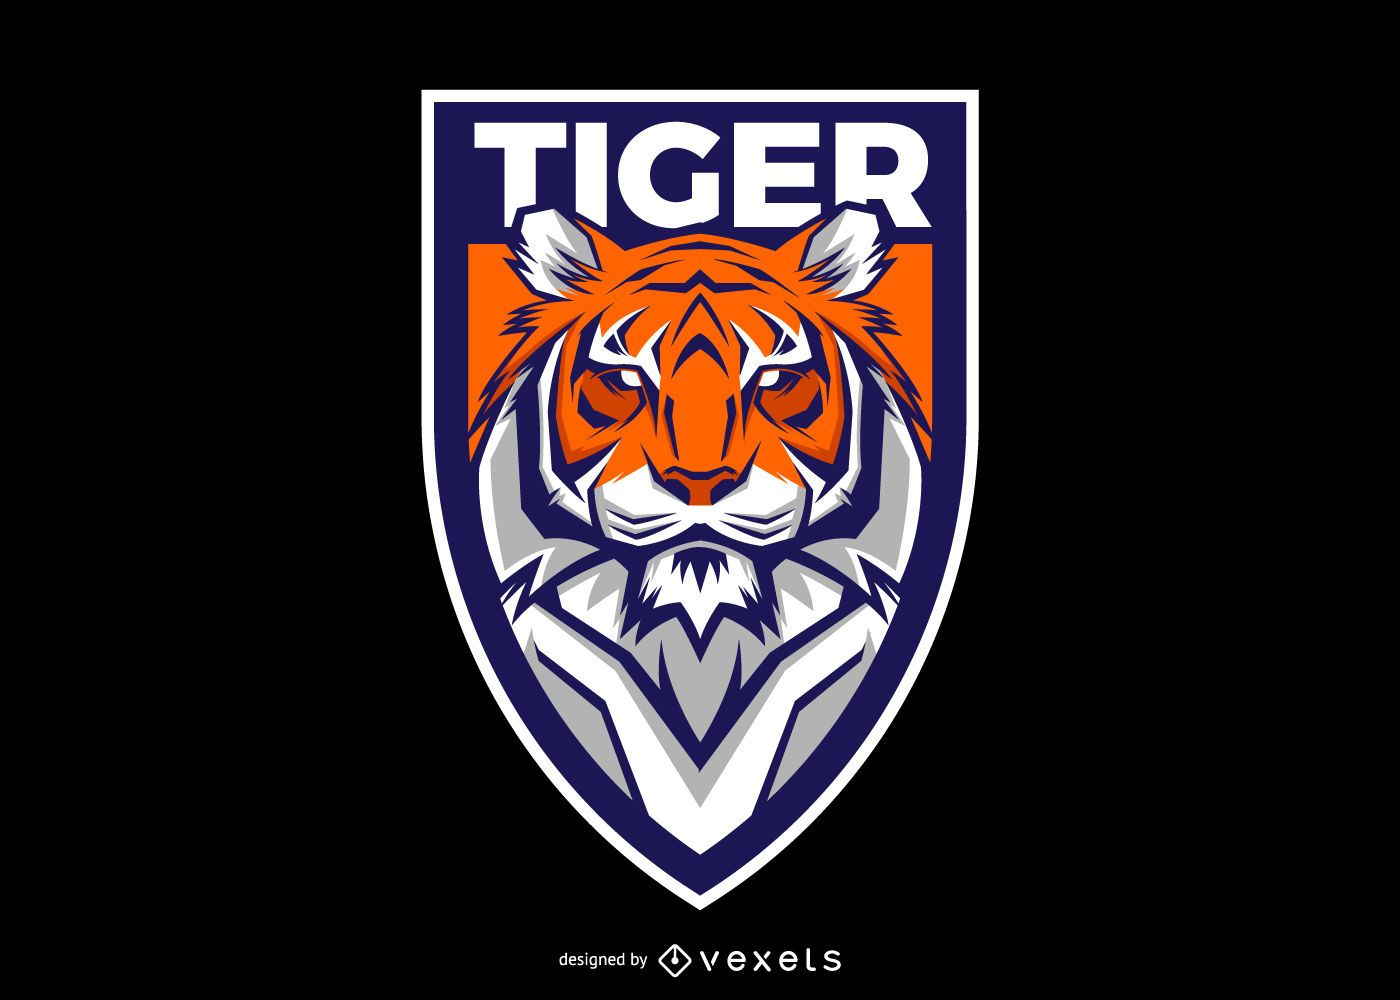 Diseño de logotipo de escudo de tigre